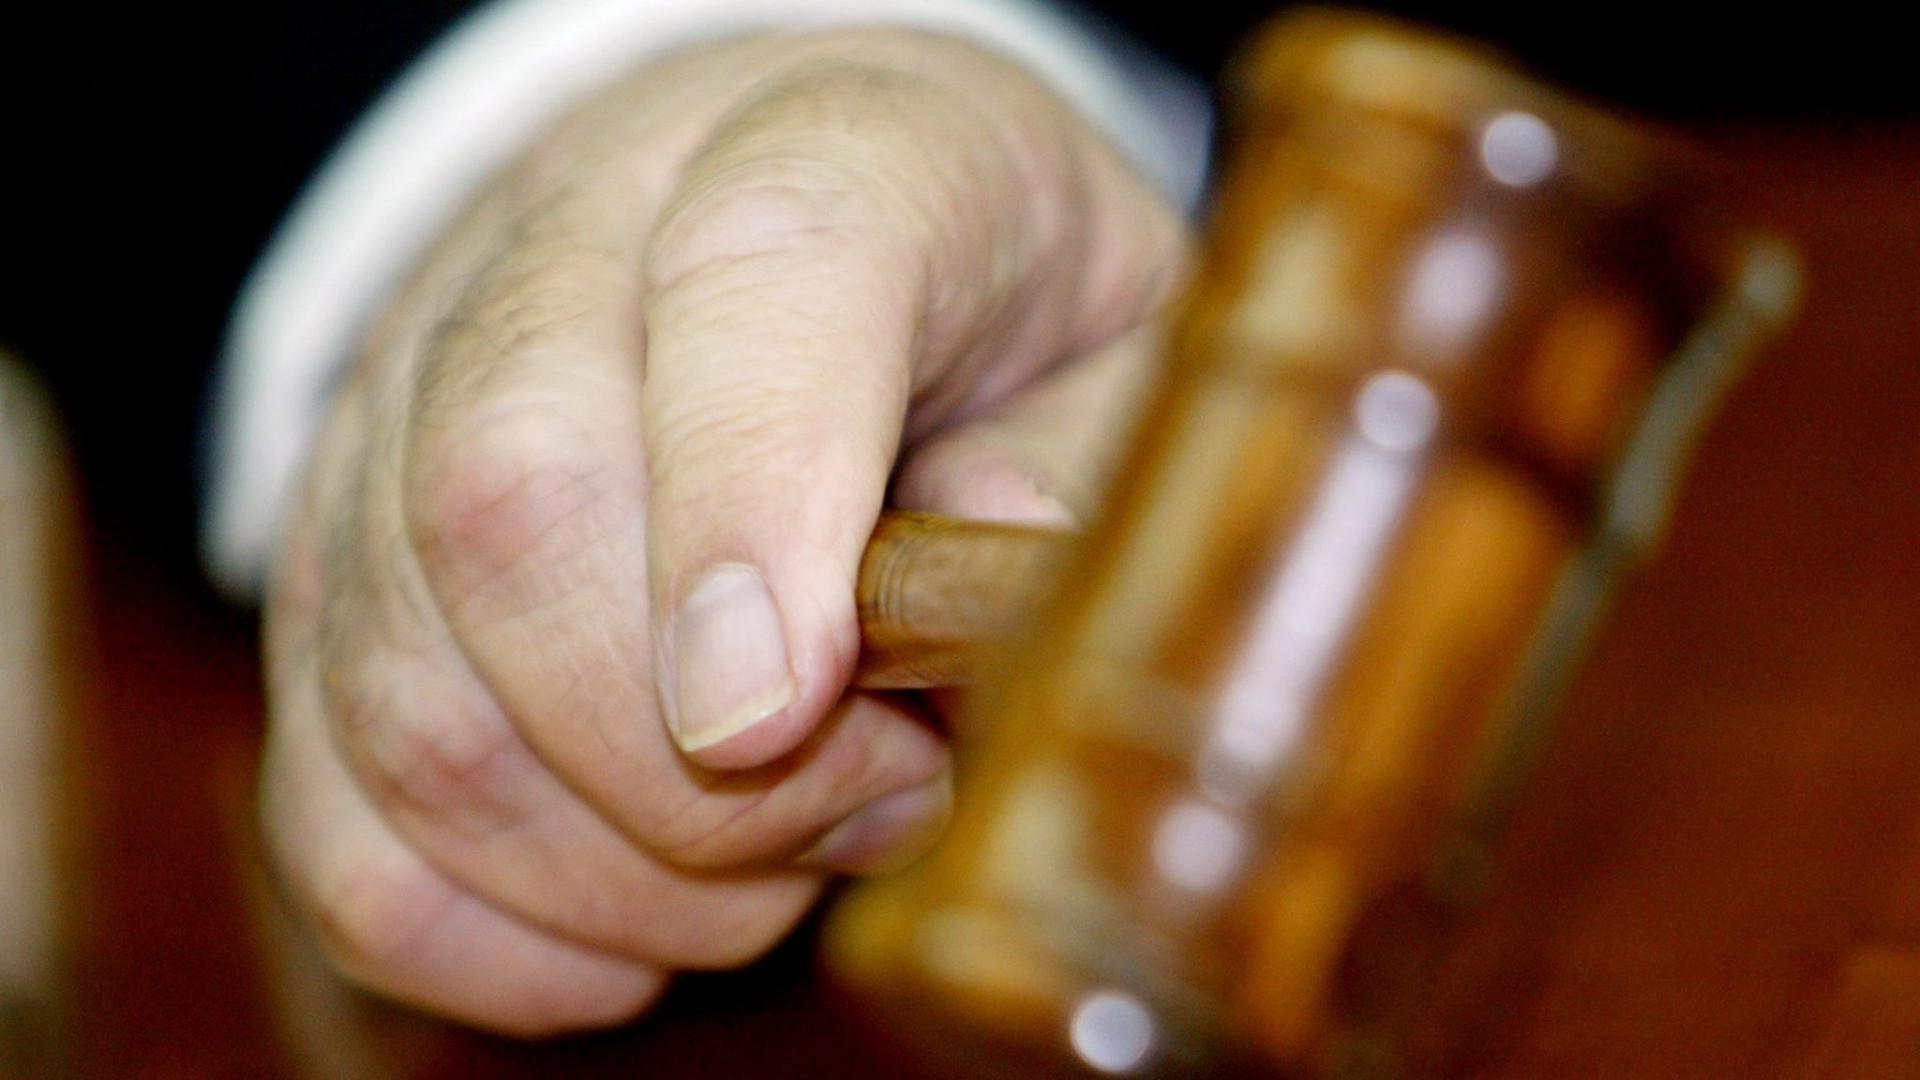 Juízes querem punir titulares de cargos públicos que ocultem riqueza